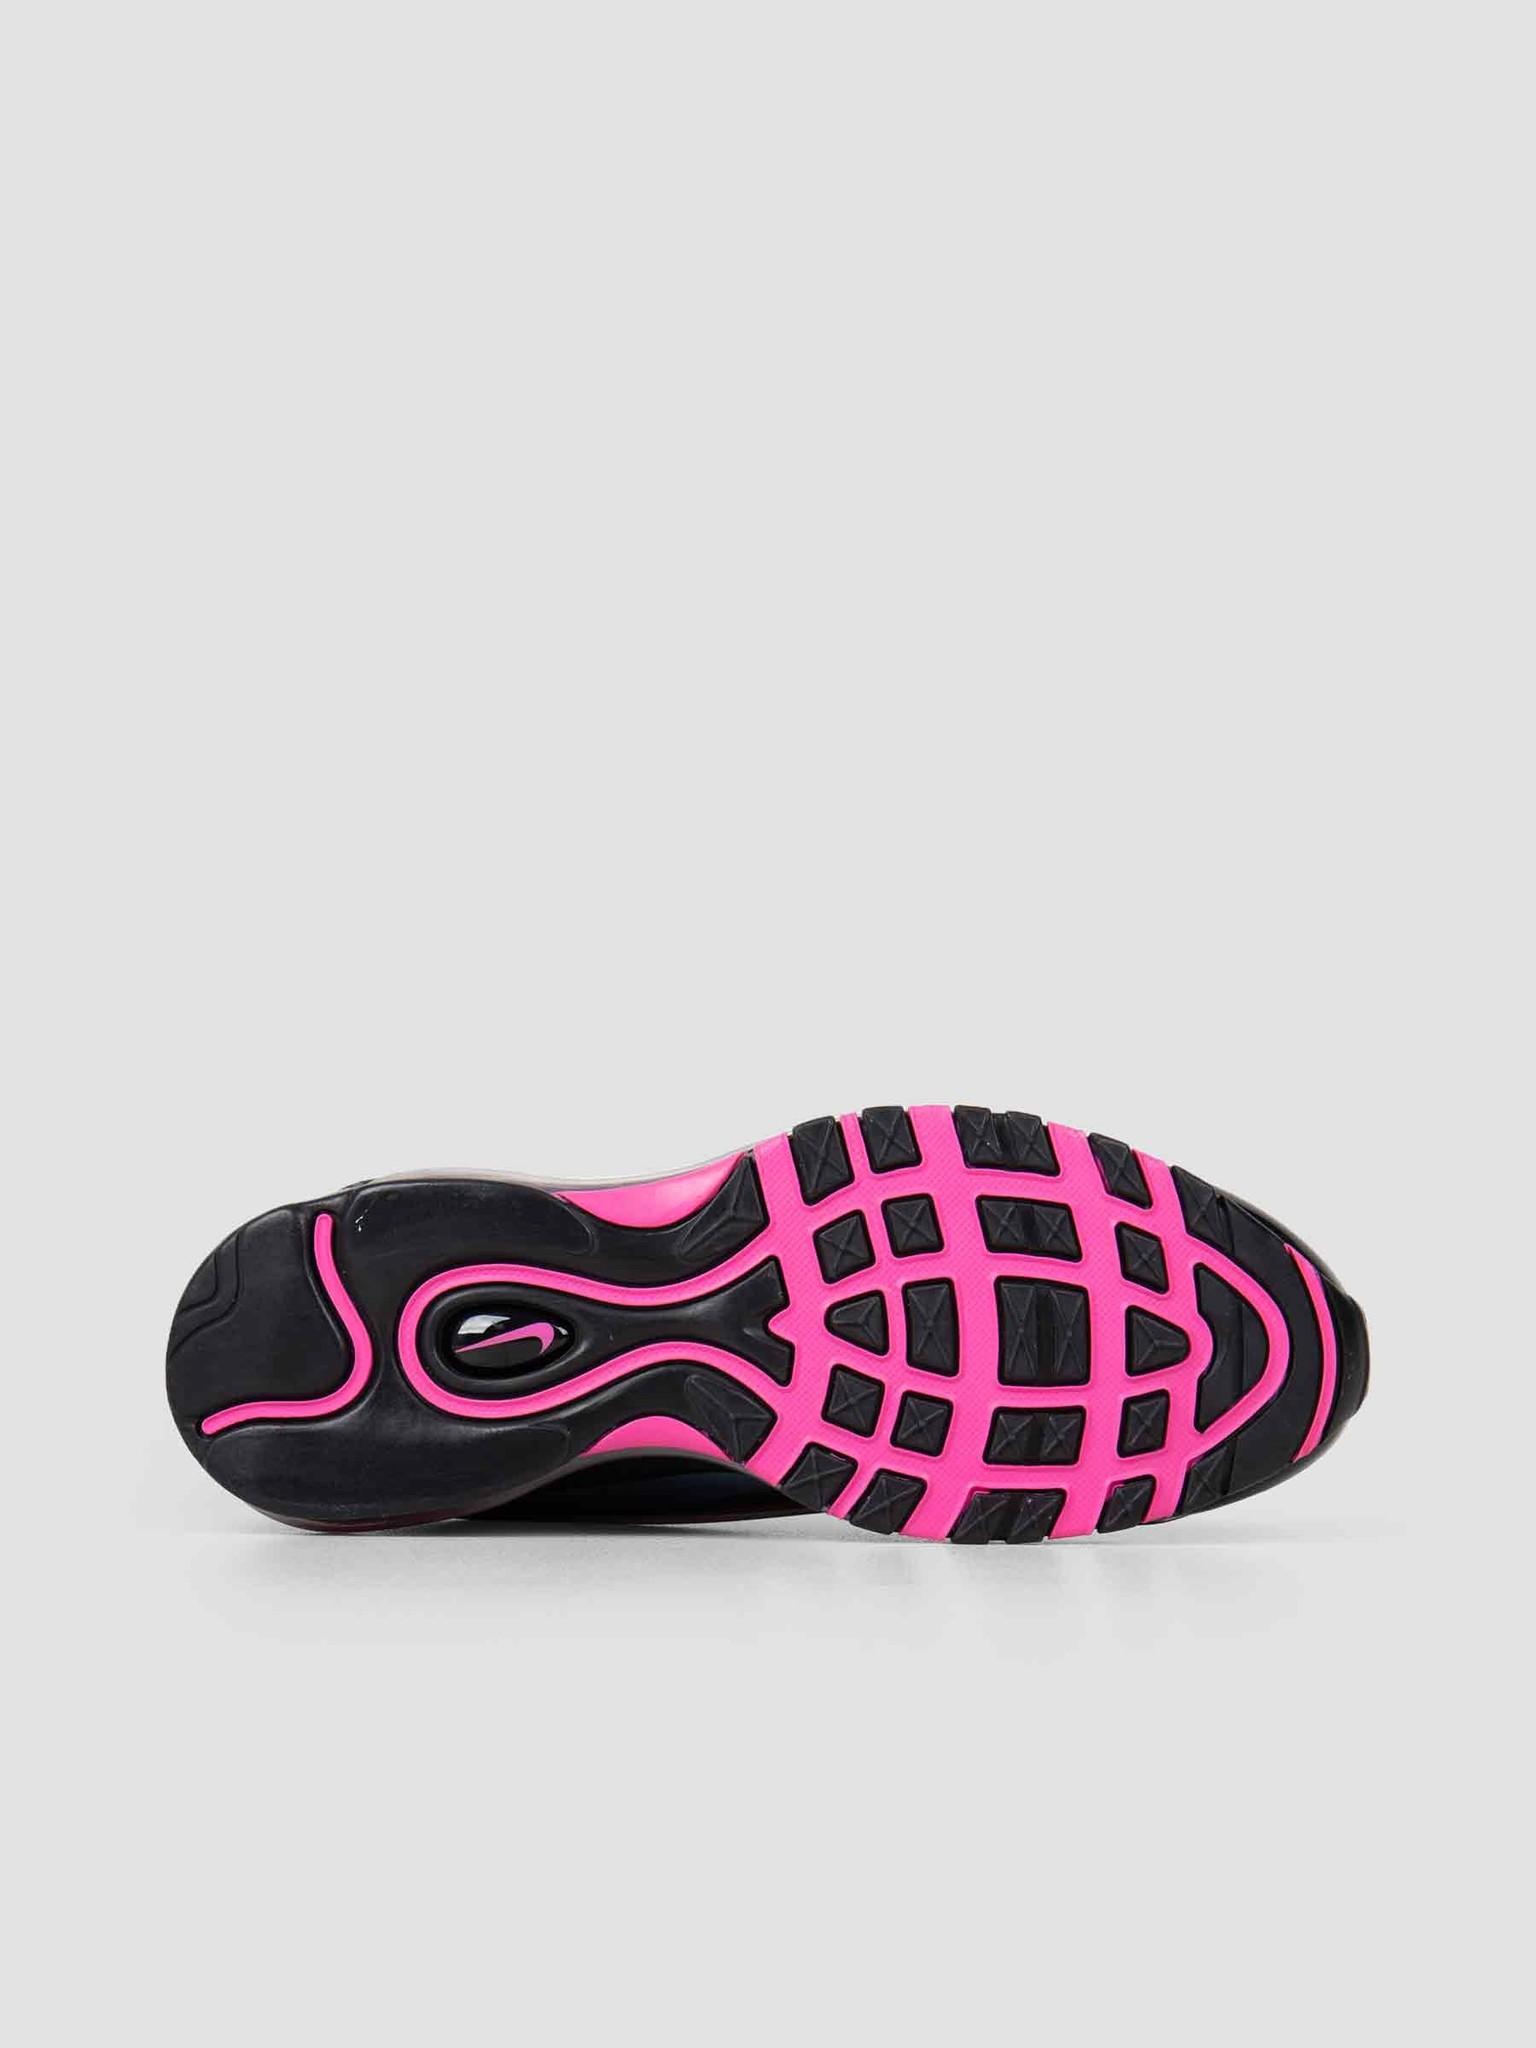 Nike Nike Air Max Deluxe Black Laser AJ7831-004